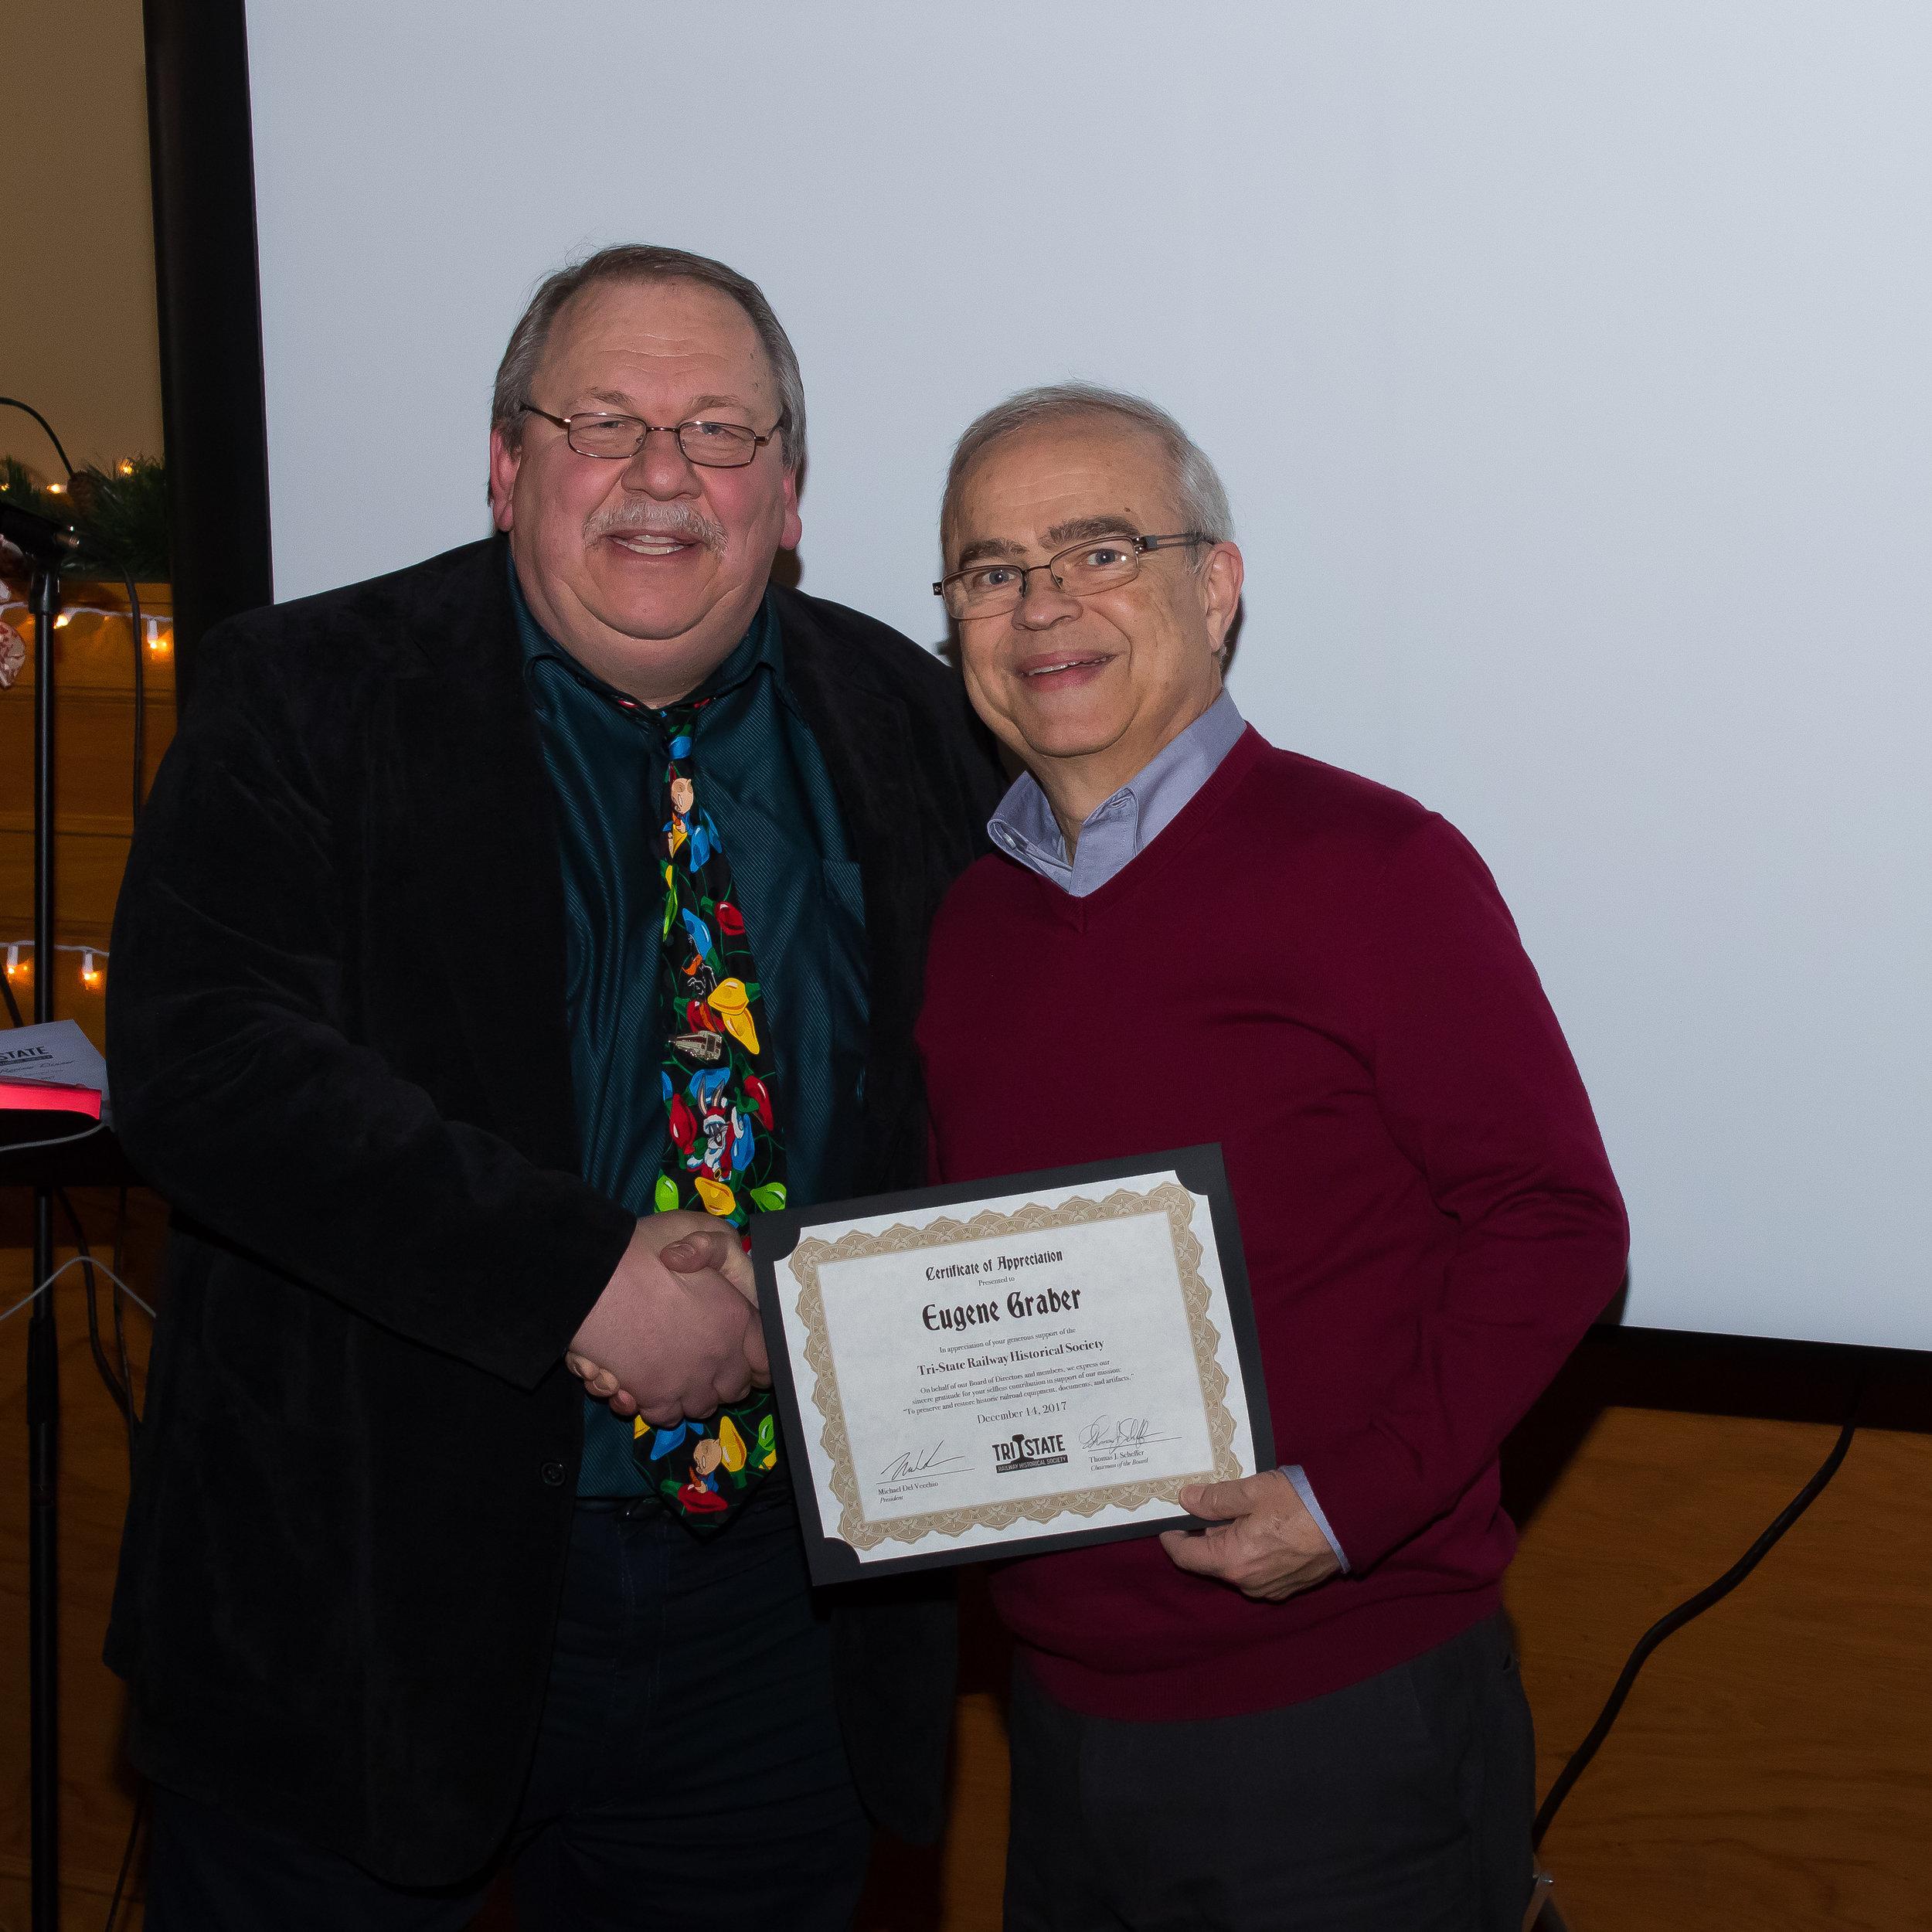 Member Eugene Graber receives a donor Certificate of Appreciation